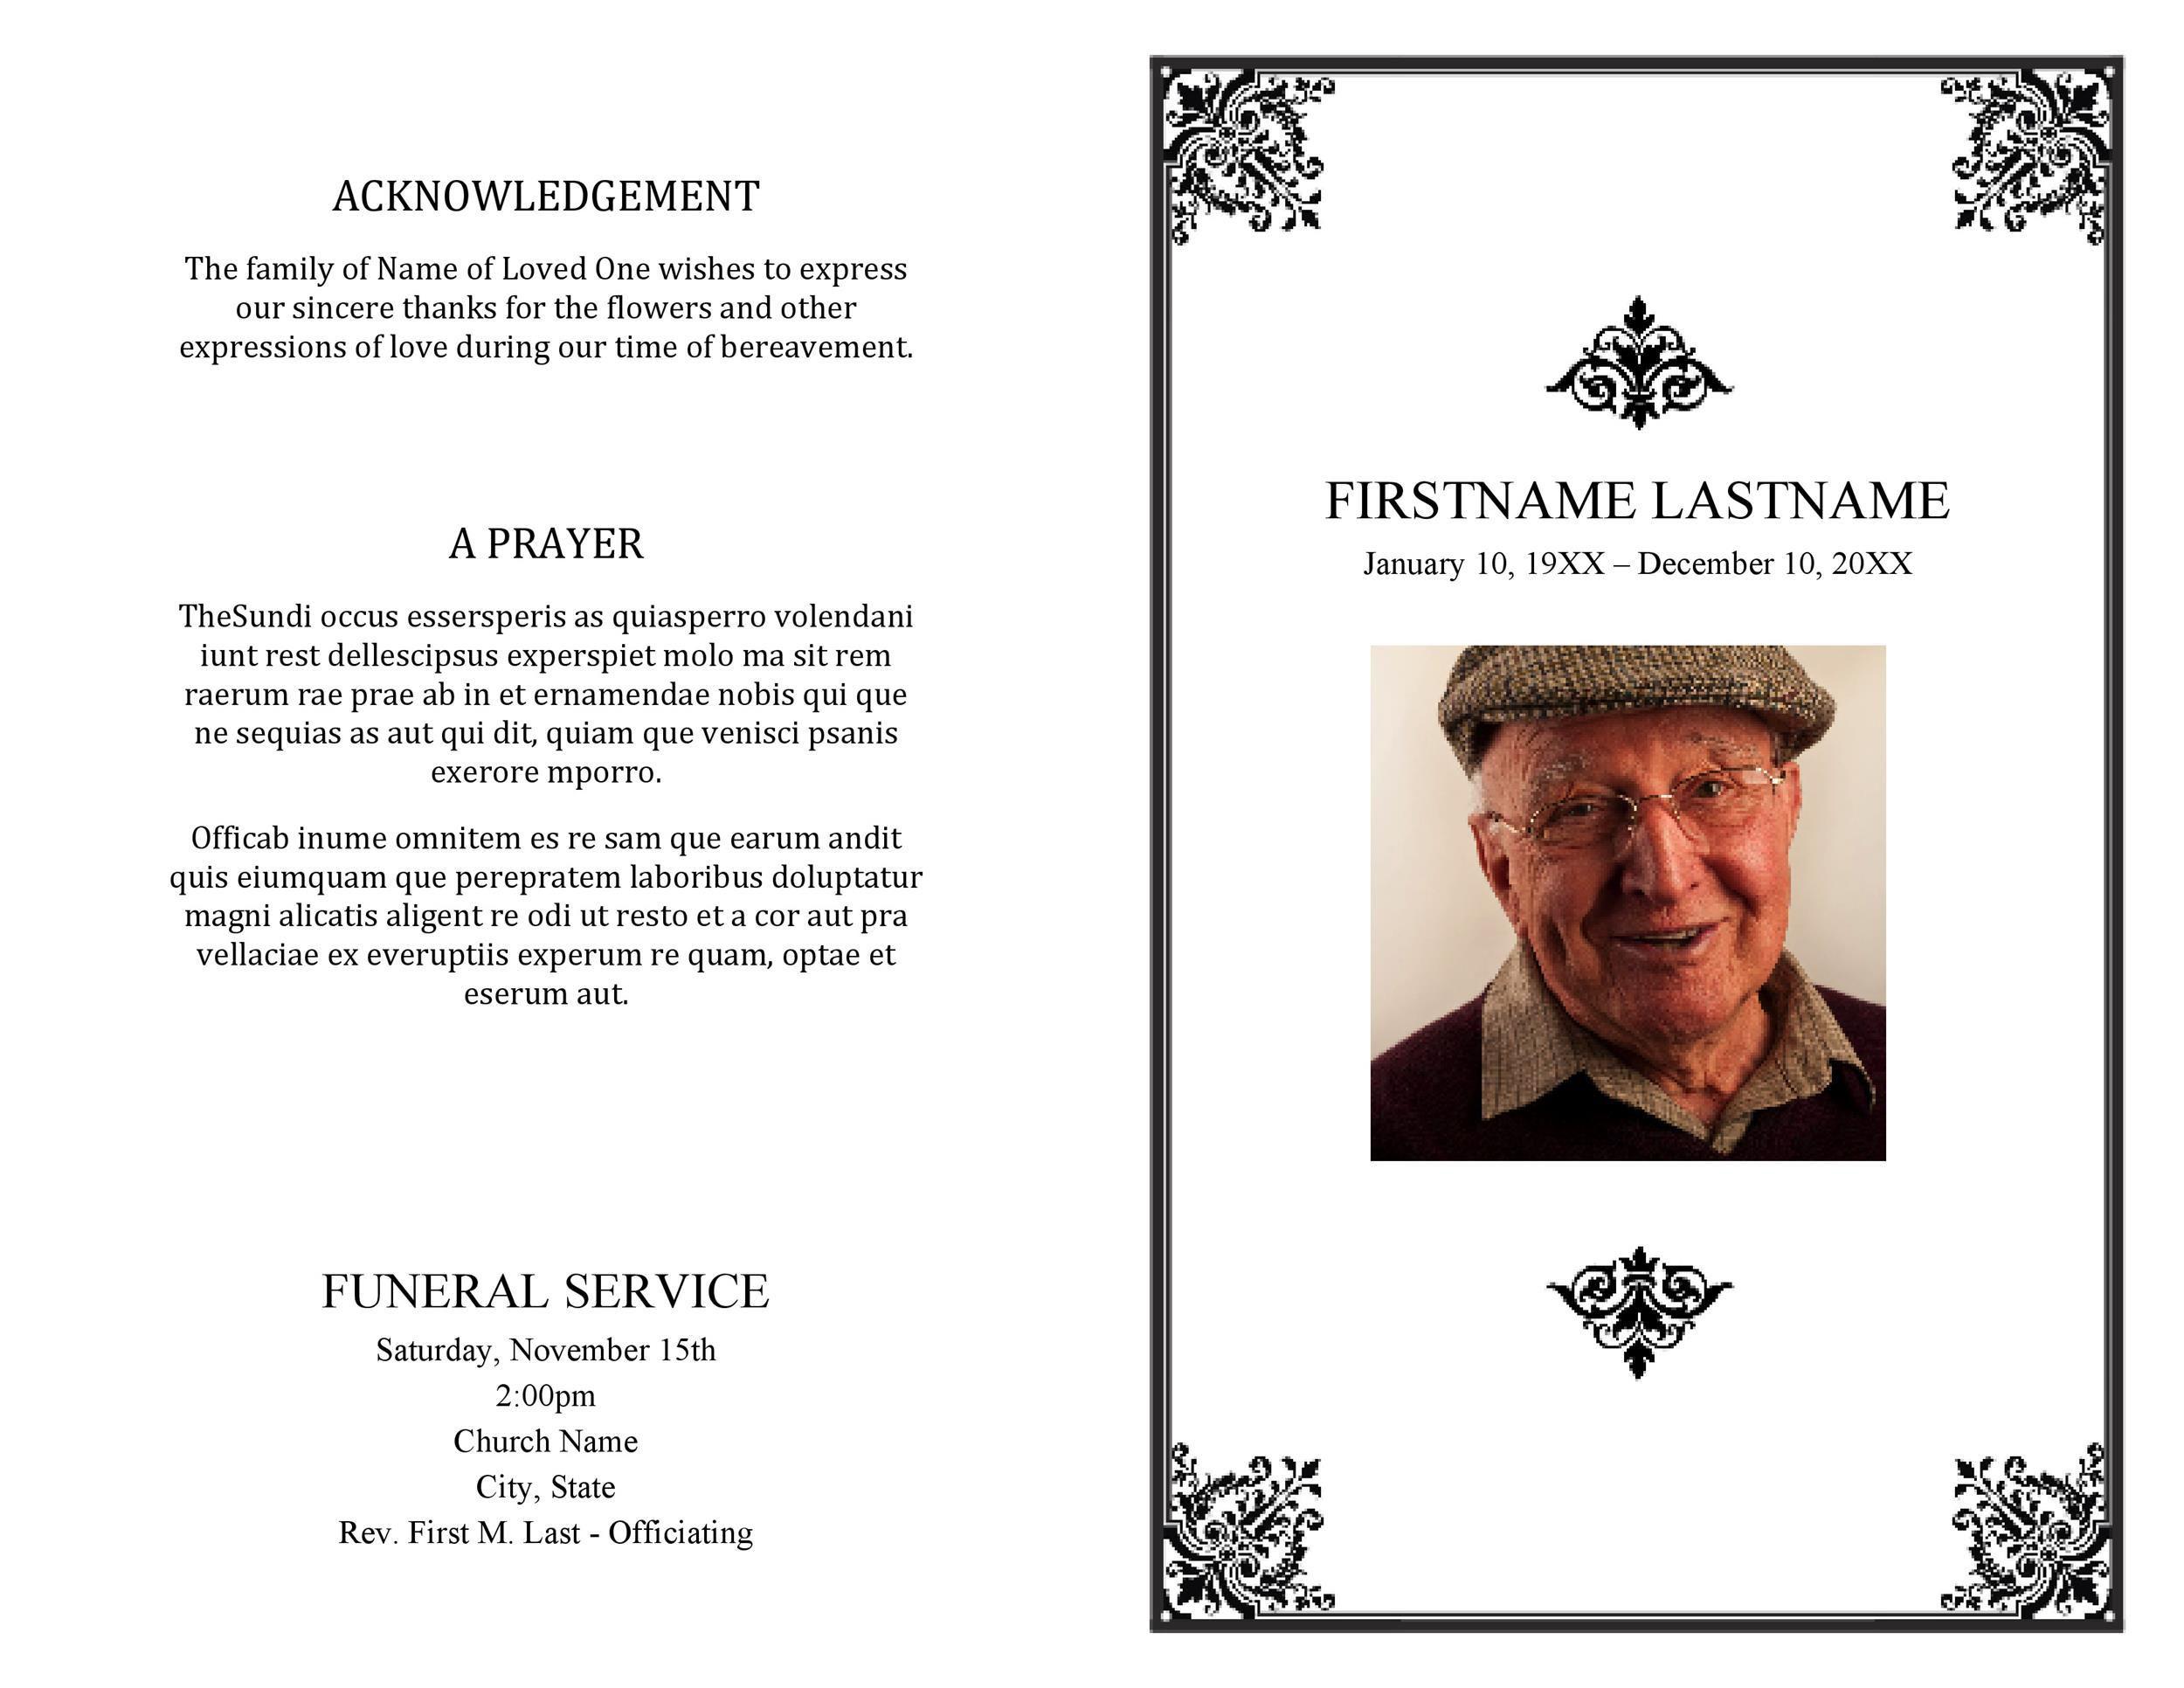 006 Striking Template For Funeral Program Free Image  Printable Download On Word Editable PdfFull